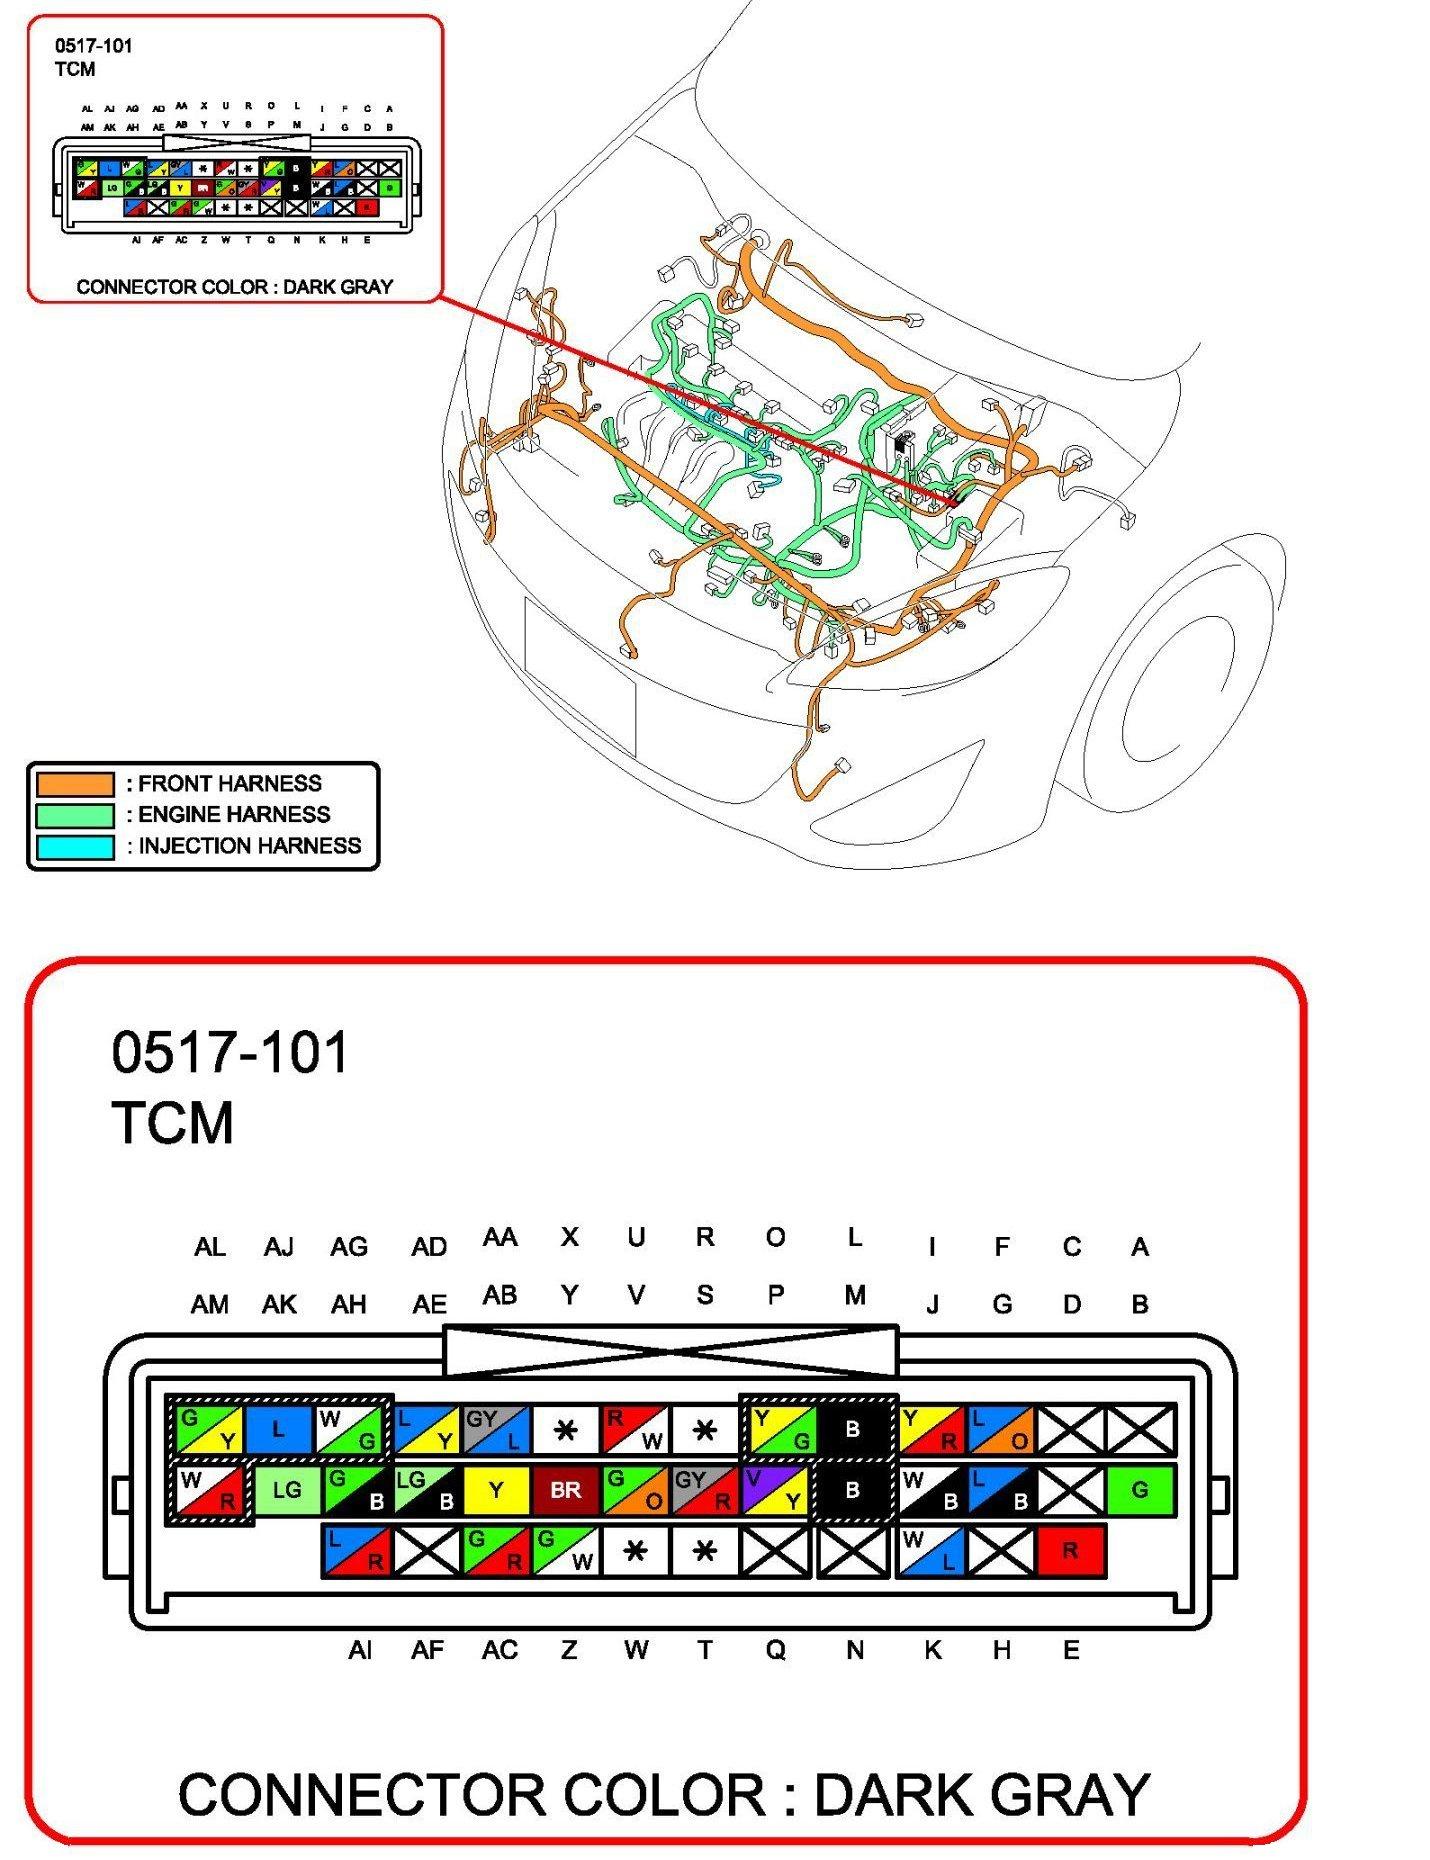 Tcm Wiring Diagram Wire Data Schema 2002 Dodge Caravan 2006 Mazda 3 House Symbols U2022 Rh Maxturner Co